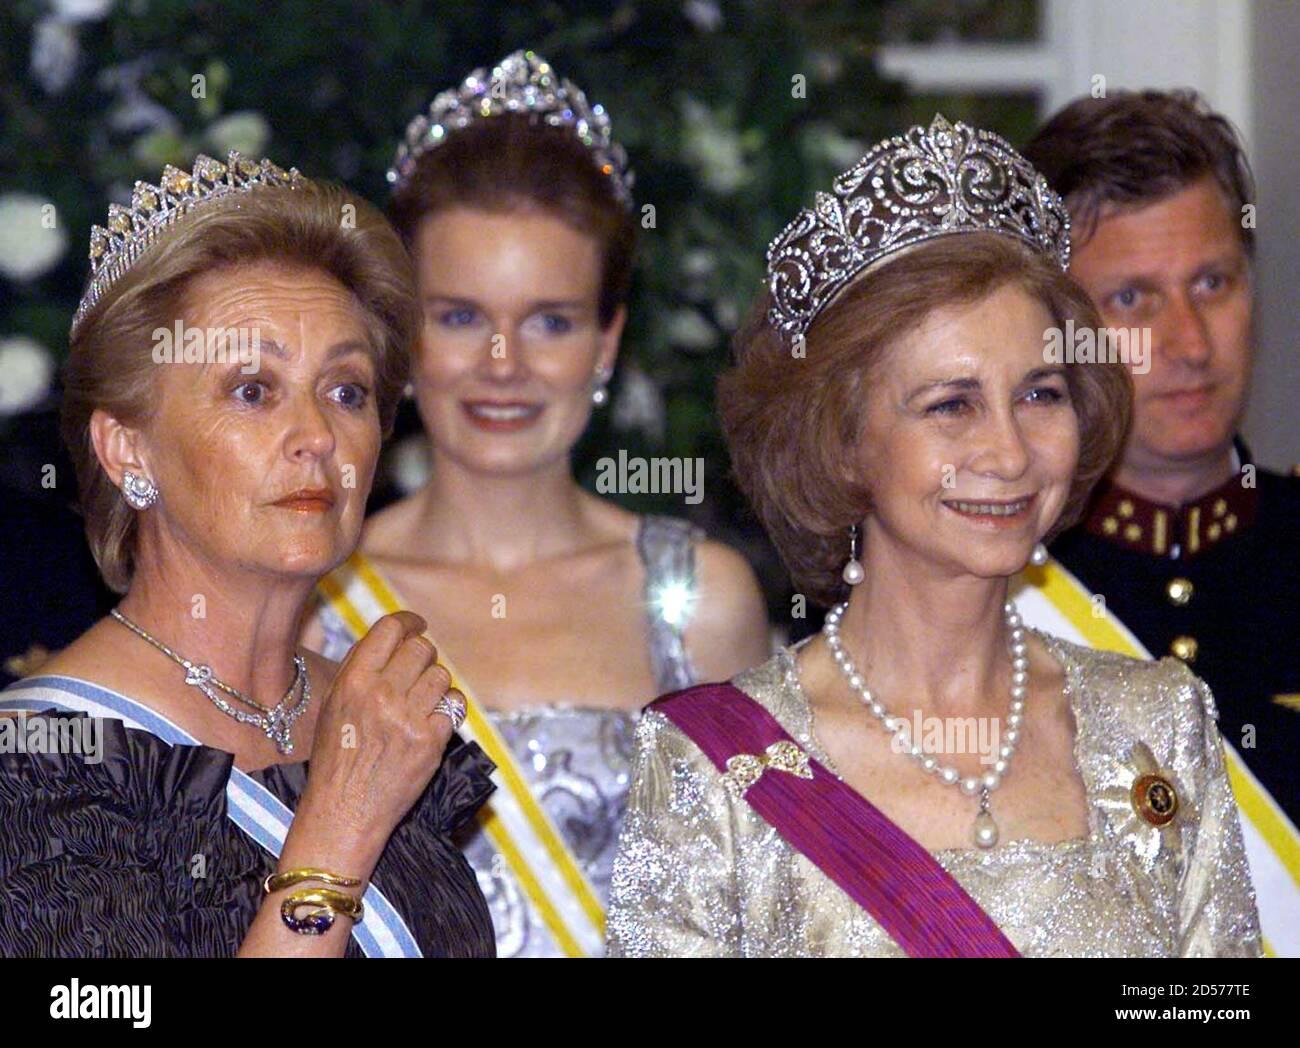 Belgian Crown